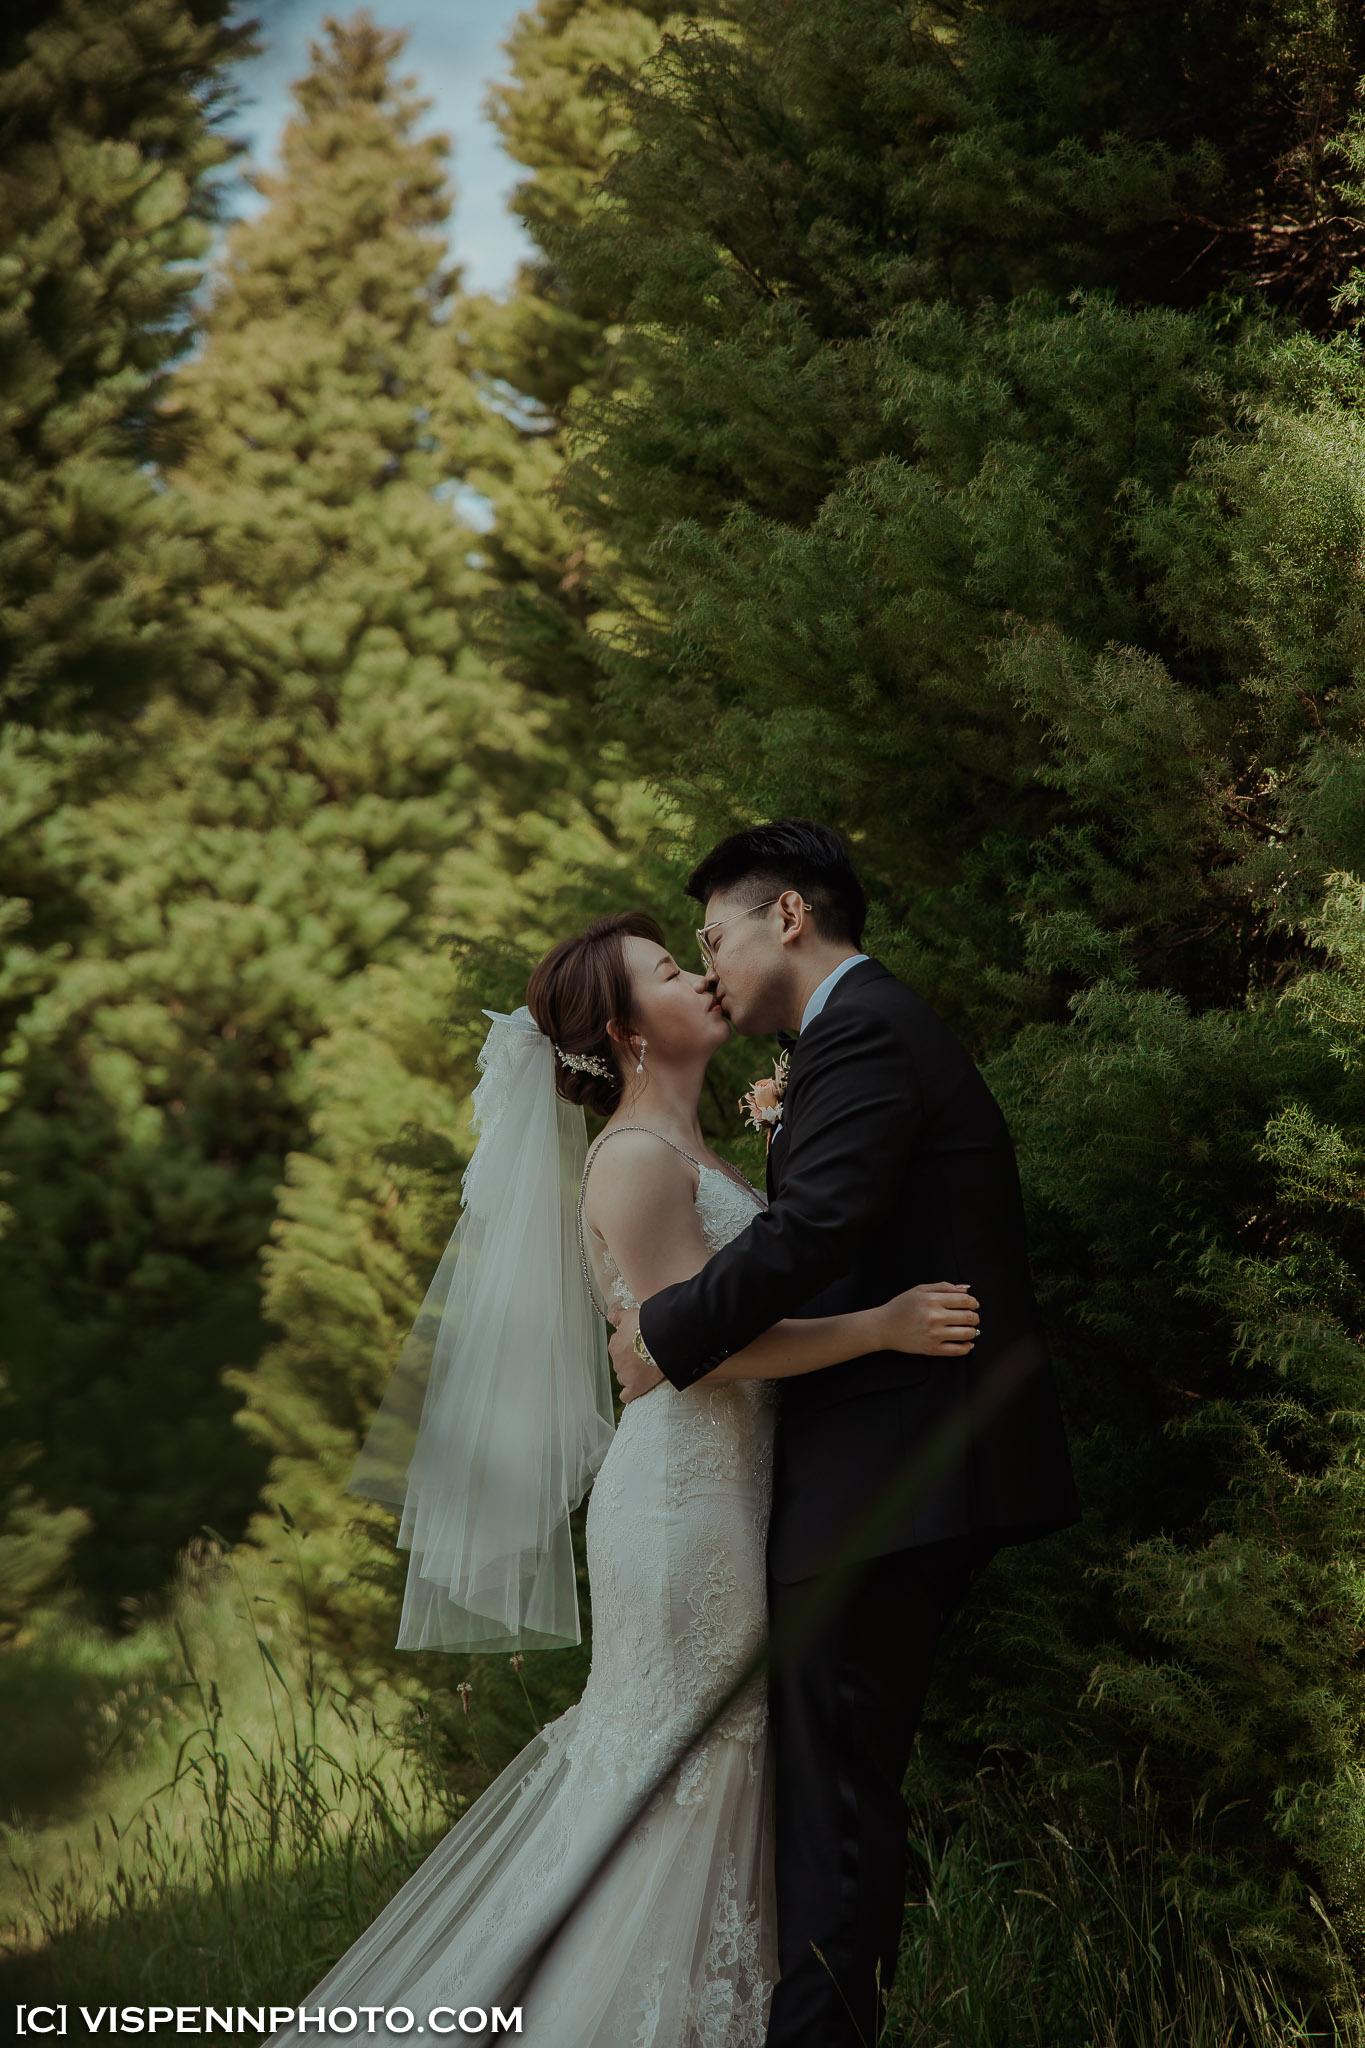 WEDDING DAY Photography Melbourne VISPENN 墨尔本 婚礼跟拍 婚礼摄像 婚礼摄影 结婚照 登记照 ElitaPB 06428 1P EOSR VISPENN